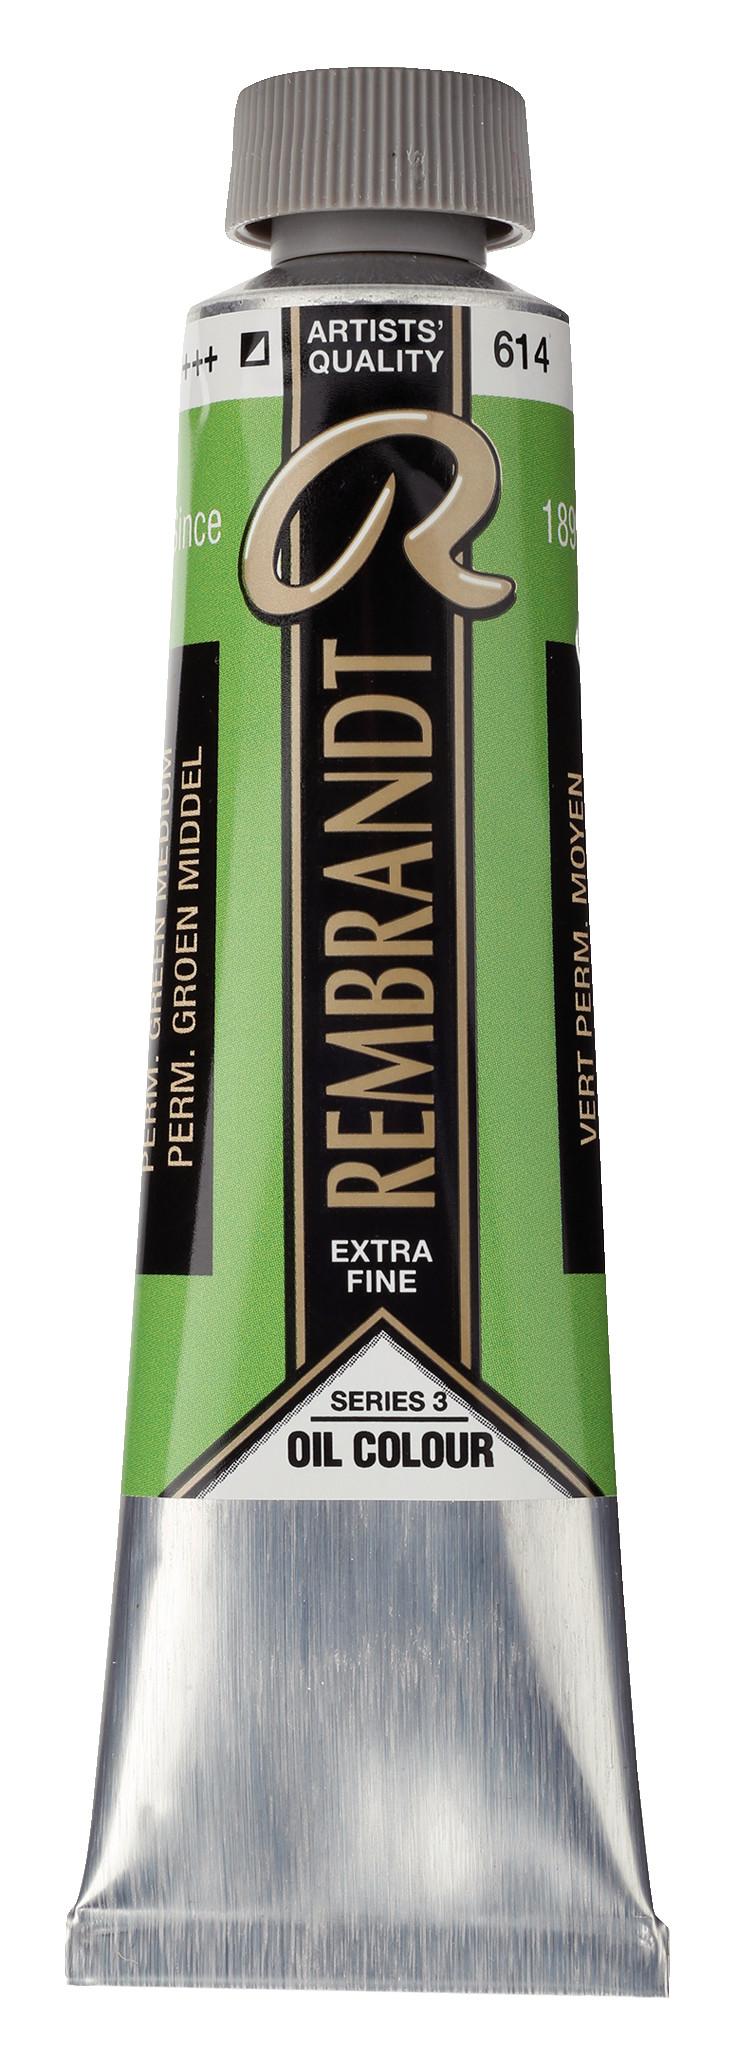 Rembrandt Oil colour Paint Permanent Green Medium (614) 40ml Tube